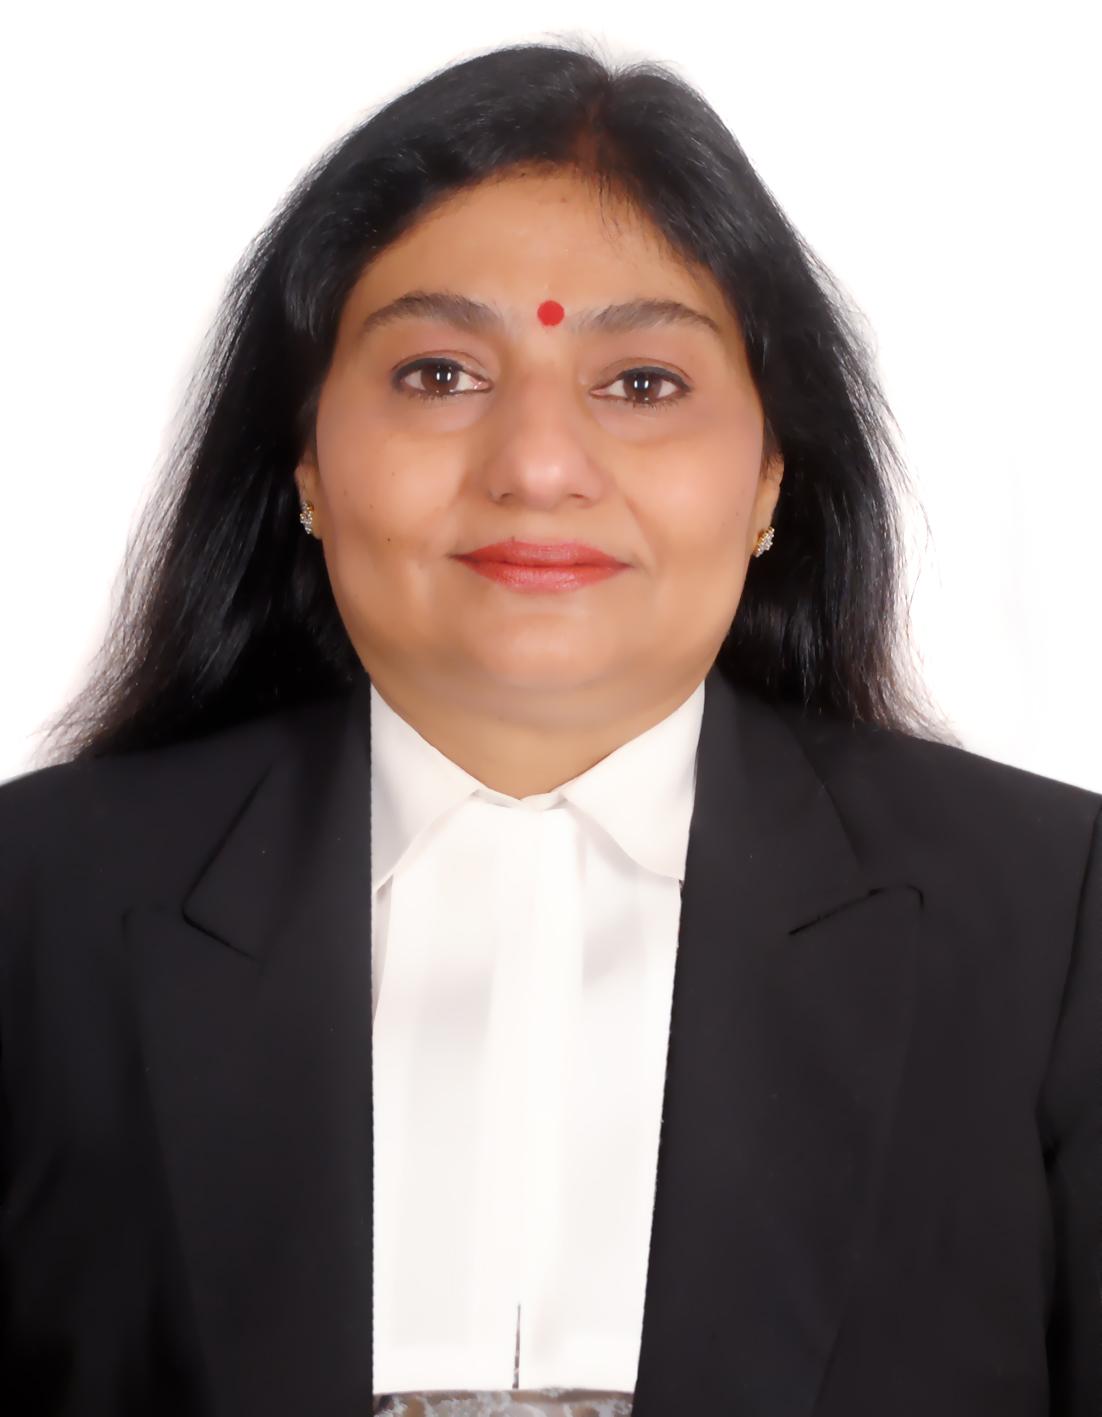 VARUNA BHANDARI GUGNANI